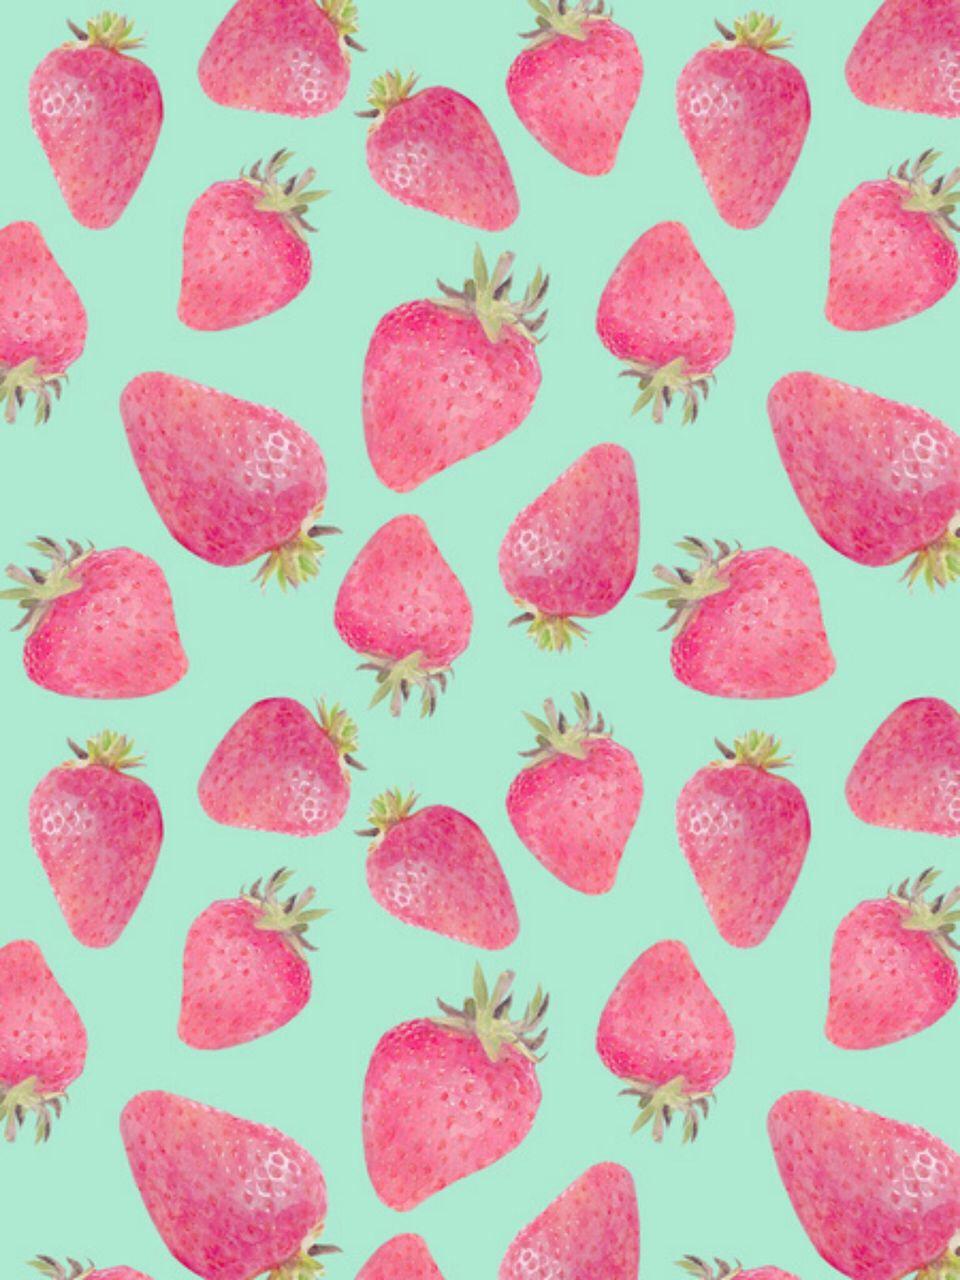 Strawberries Background Strawberry art, Prints